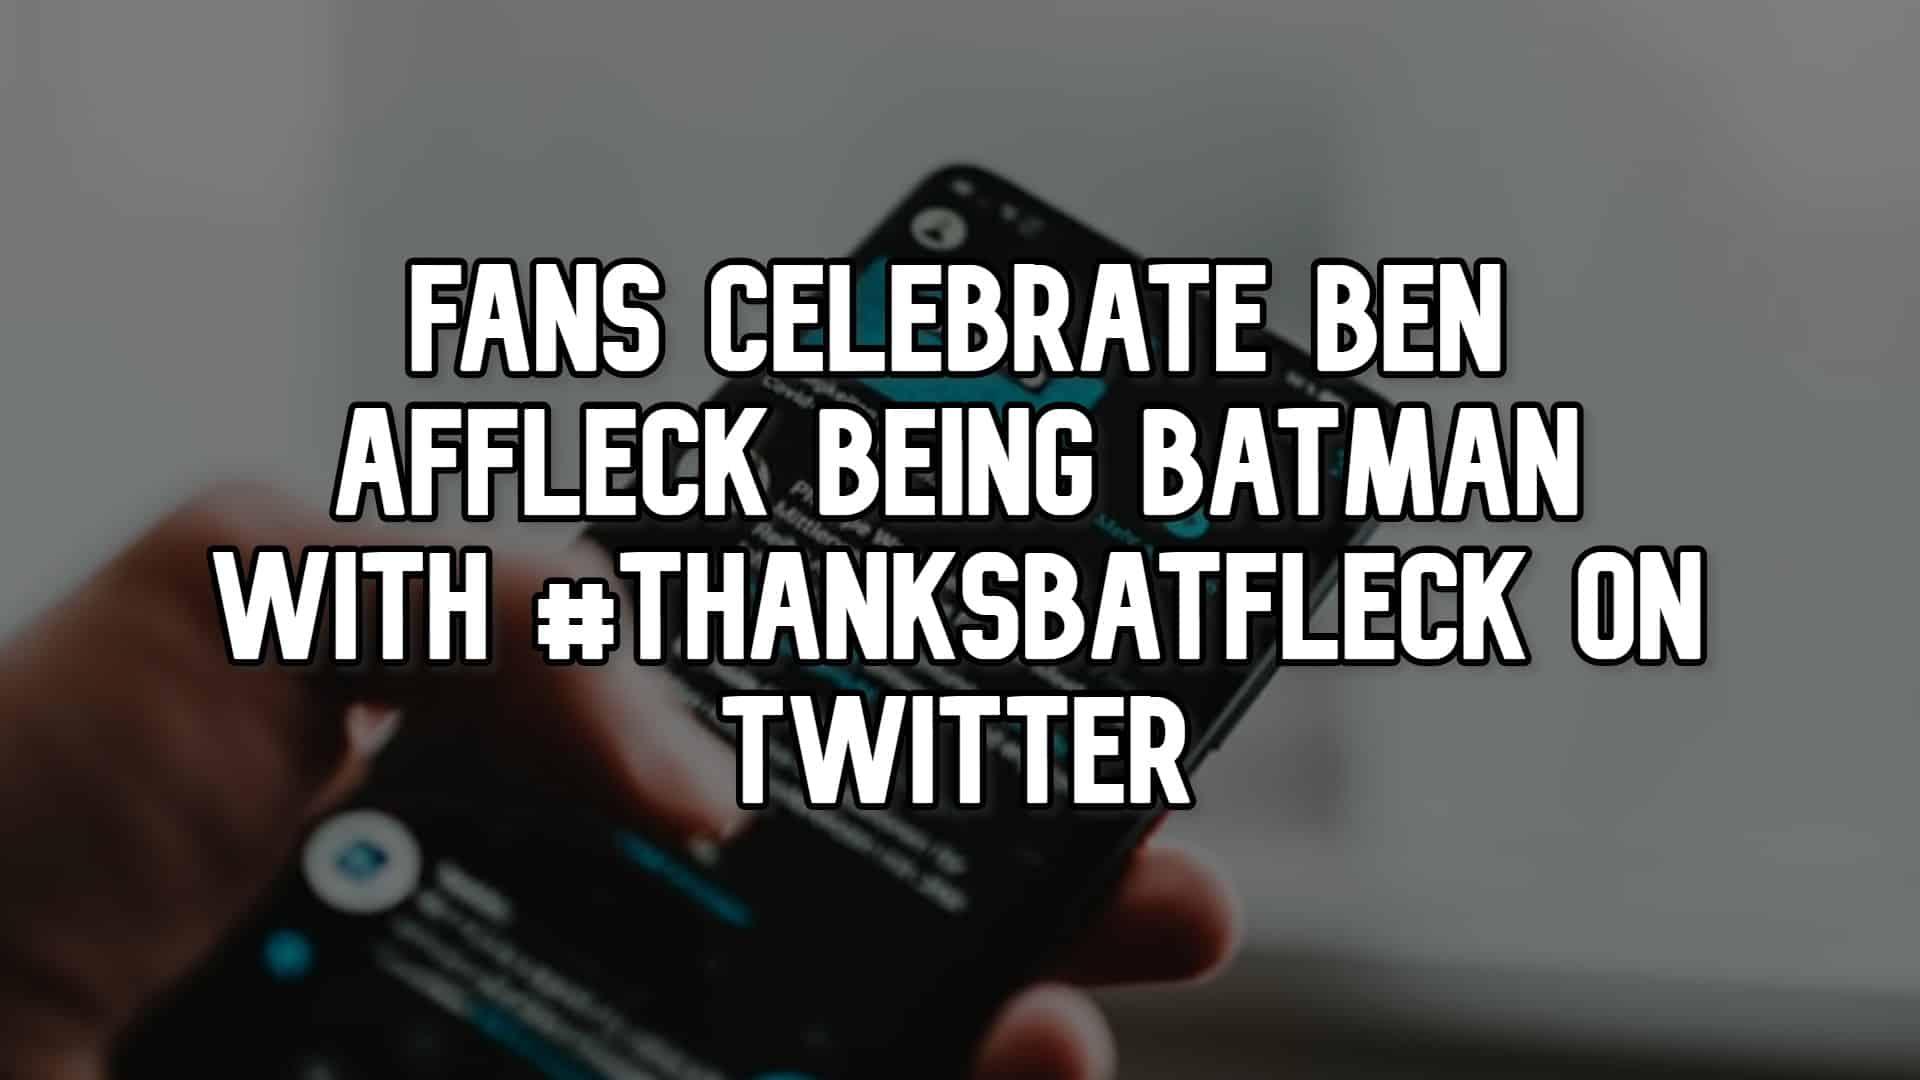 Fans Celebrate Ben Affleck Being Batman with #ThanksBatfleck on Twitter